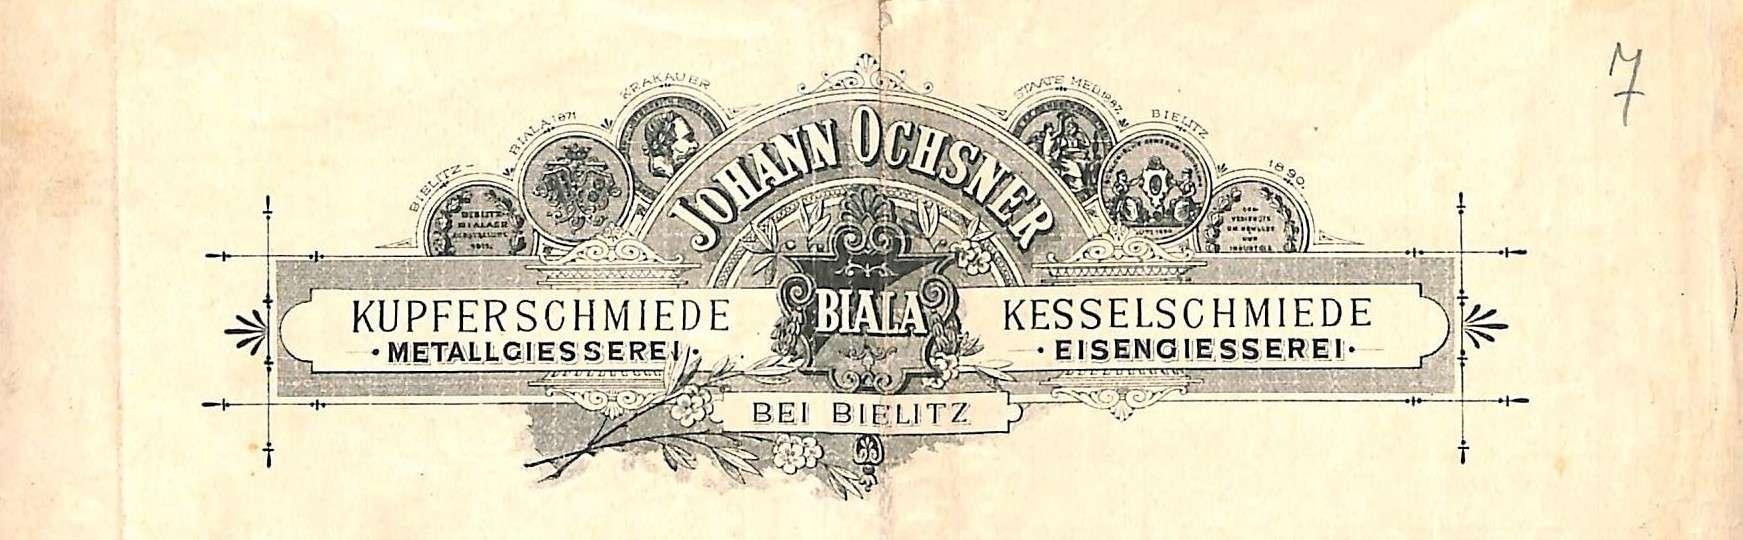 Briefkopf 1895